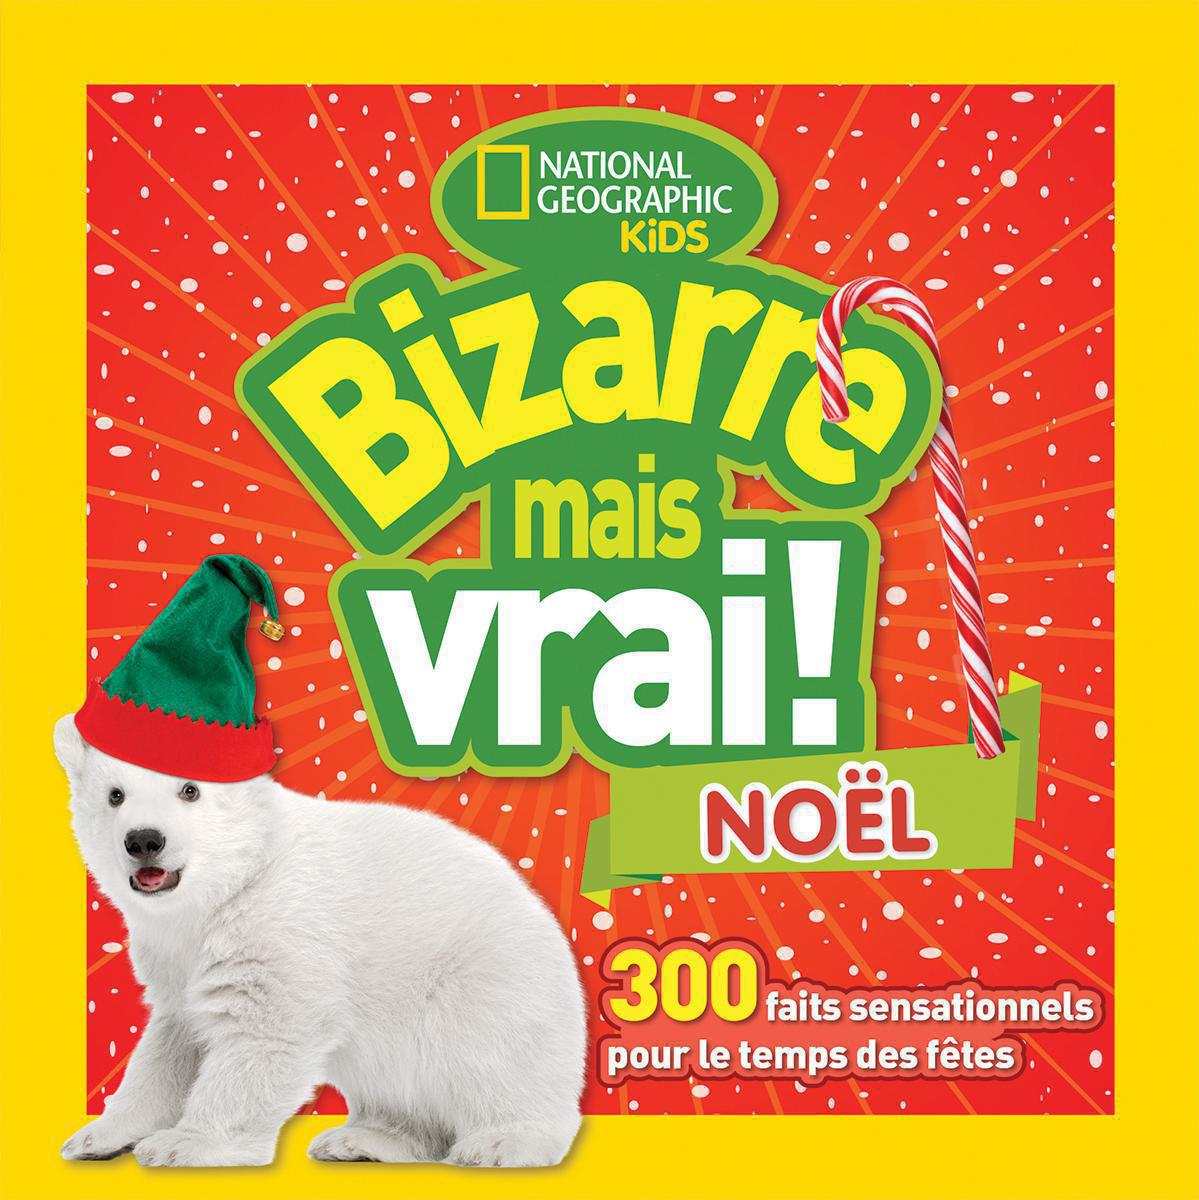 National Geographic Kids : Bizarre mais vrai! Noël